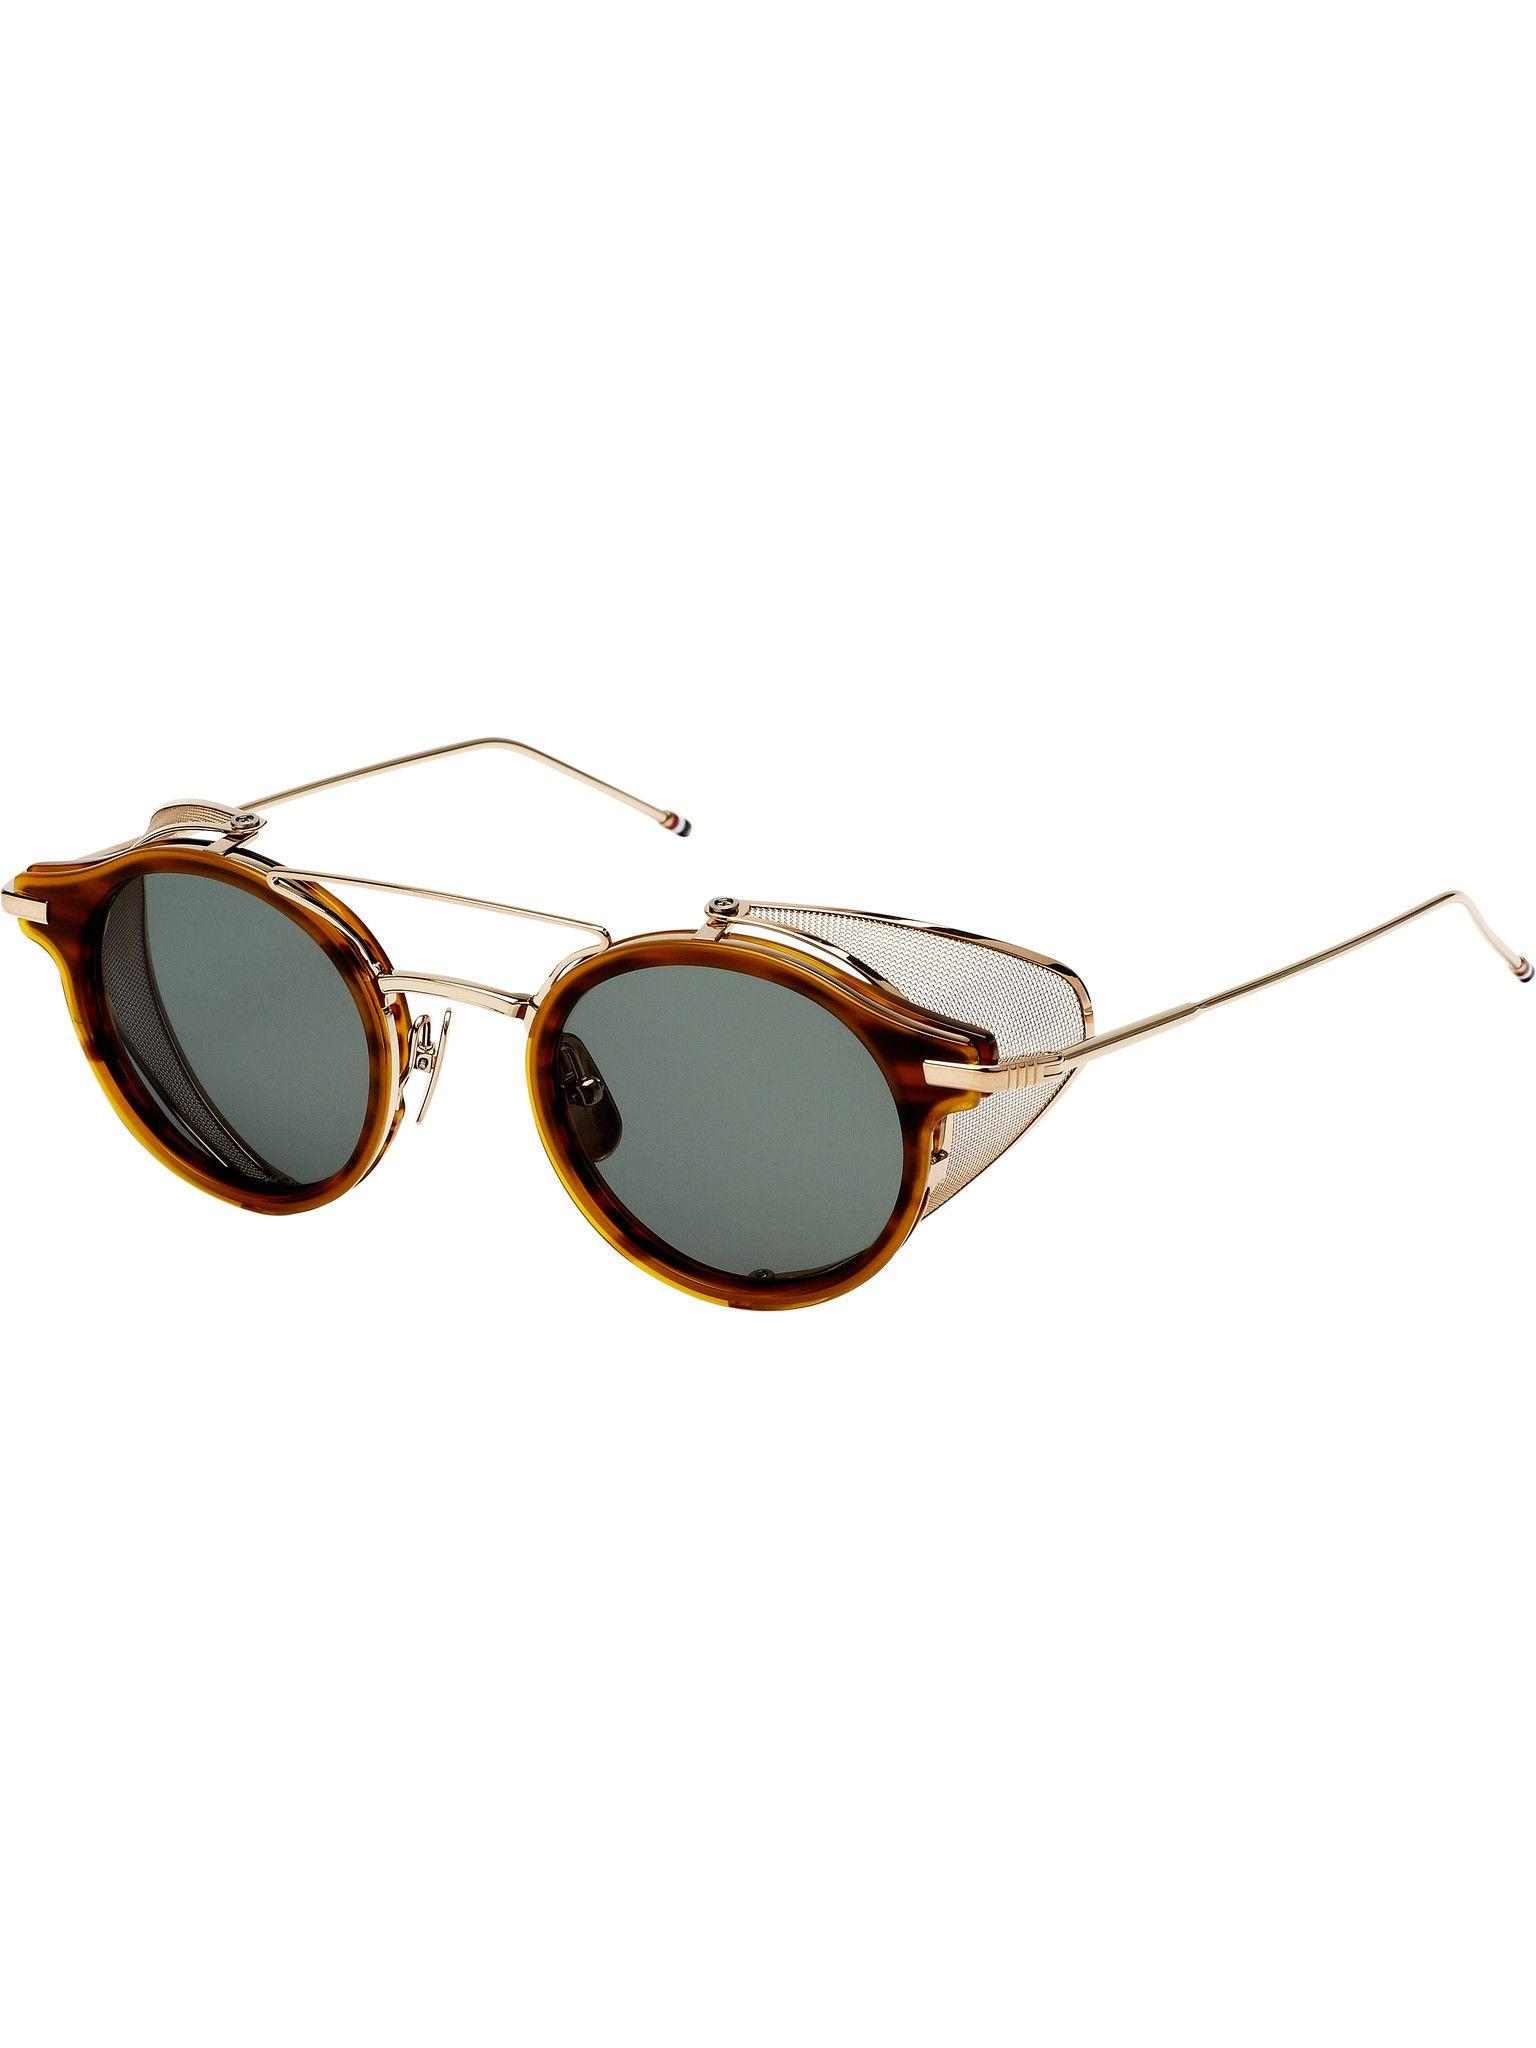 fcfbfd1931b Thom Browne TB-804-A Sunglasses